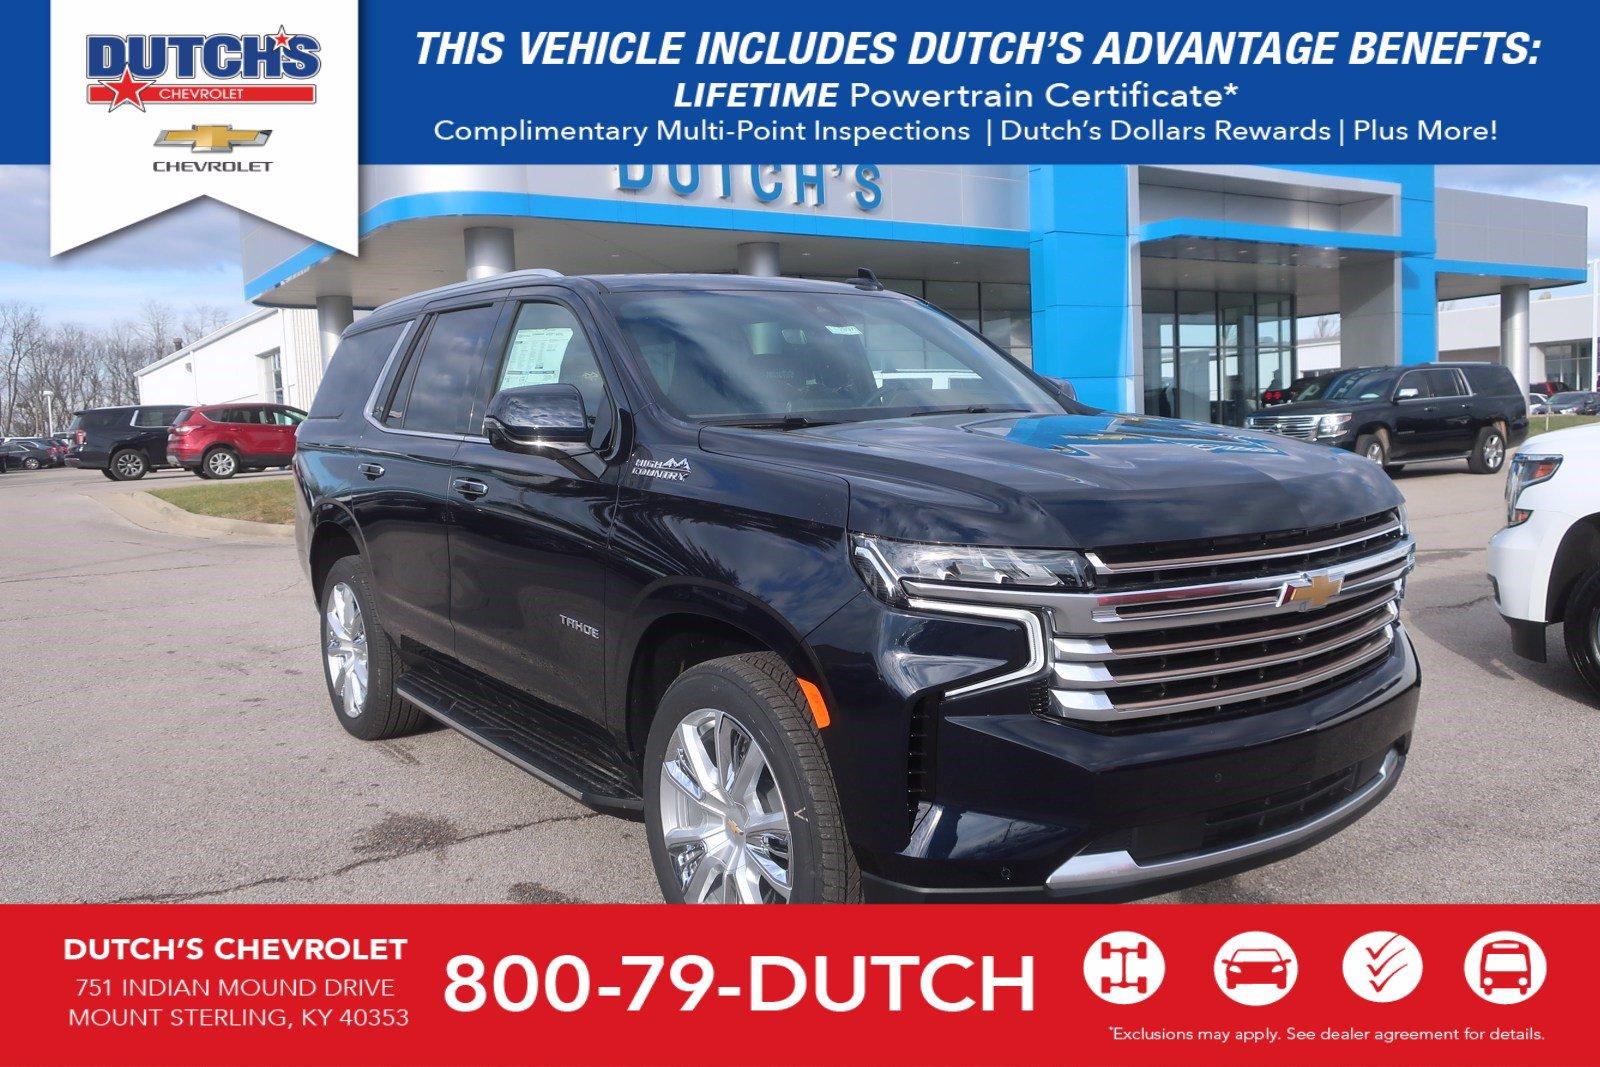 New 2021 Chevrolet Tahoe For Sale At Dutch S Auto Vin 1gnsktkl6mr185238